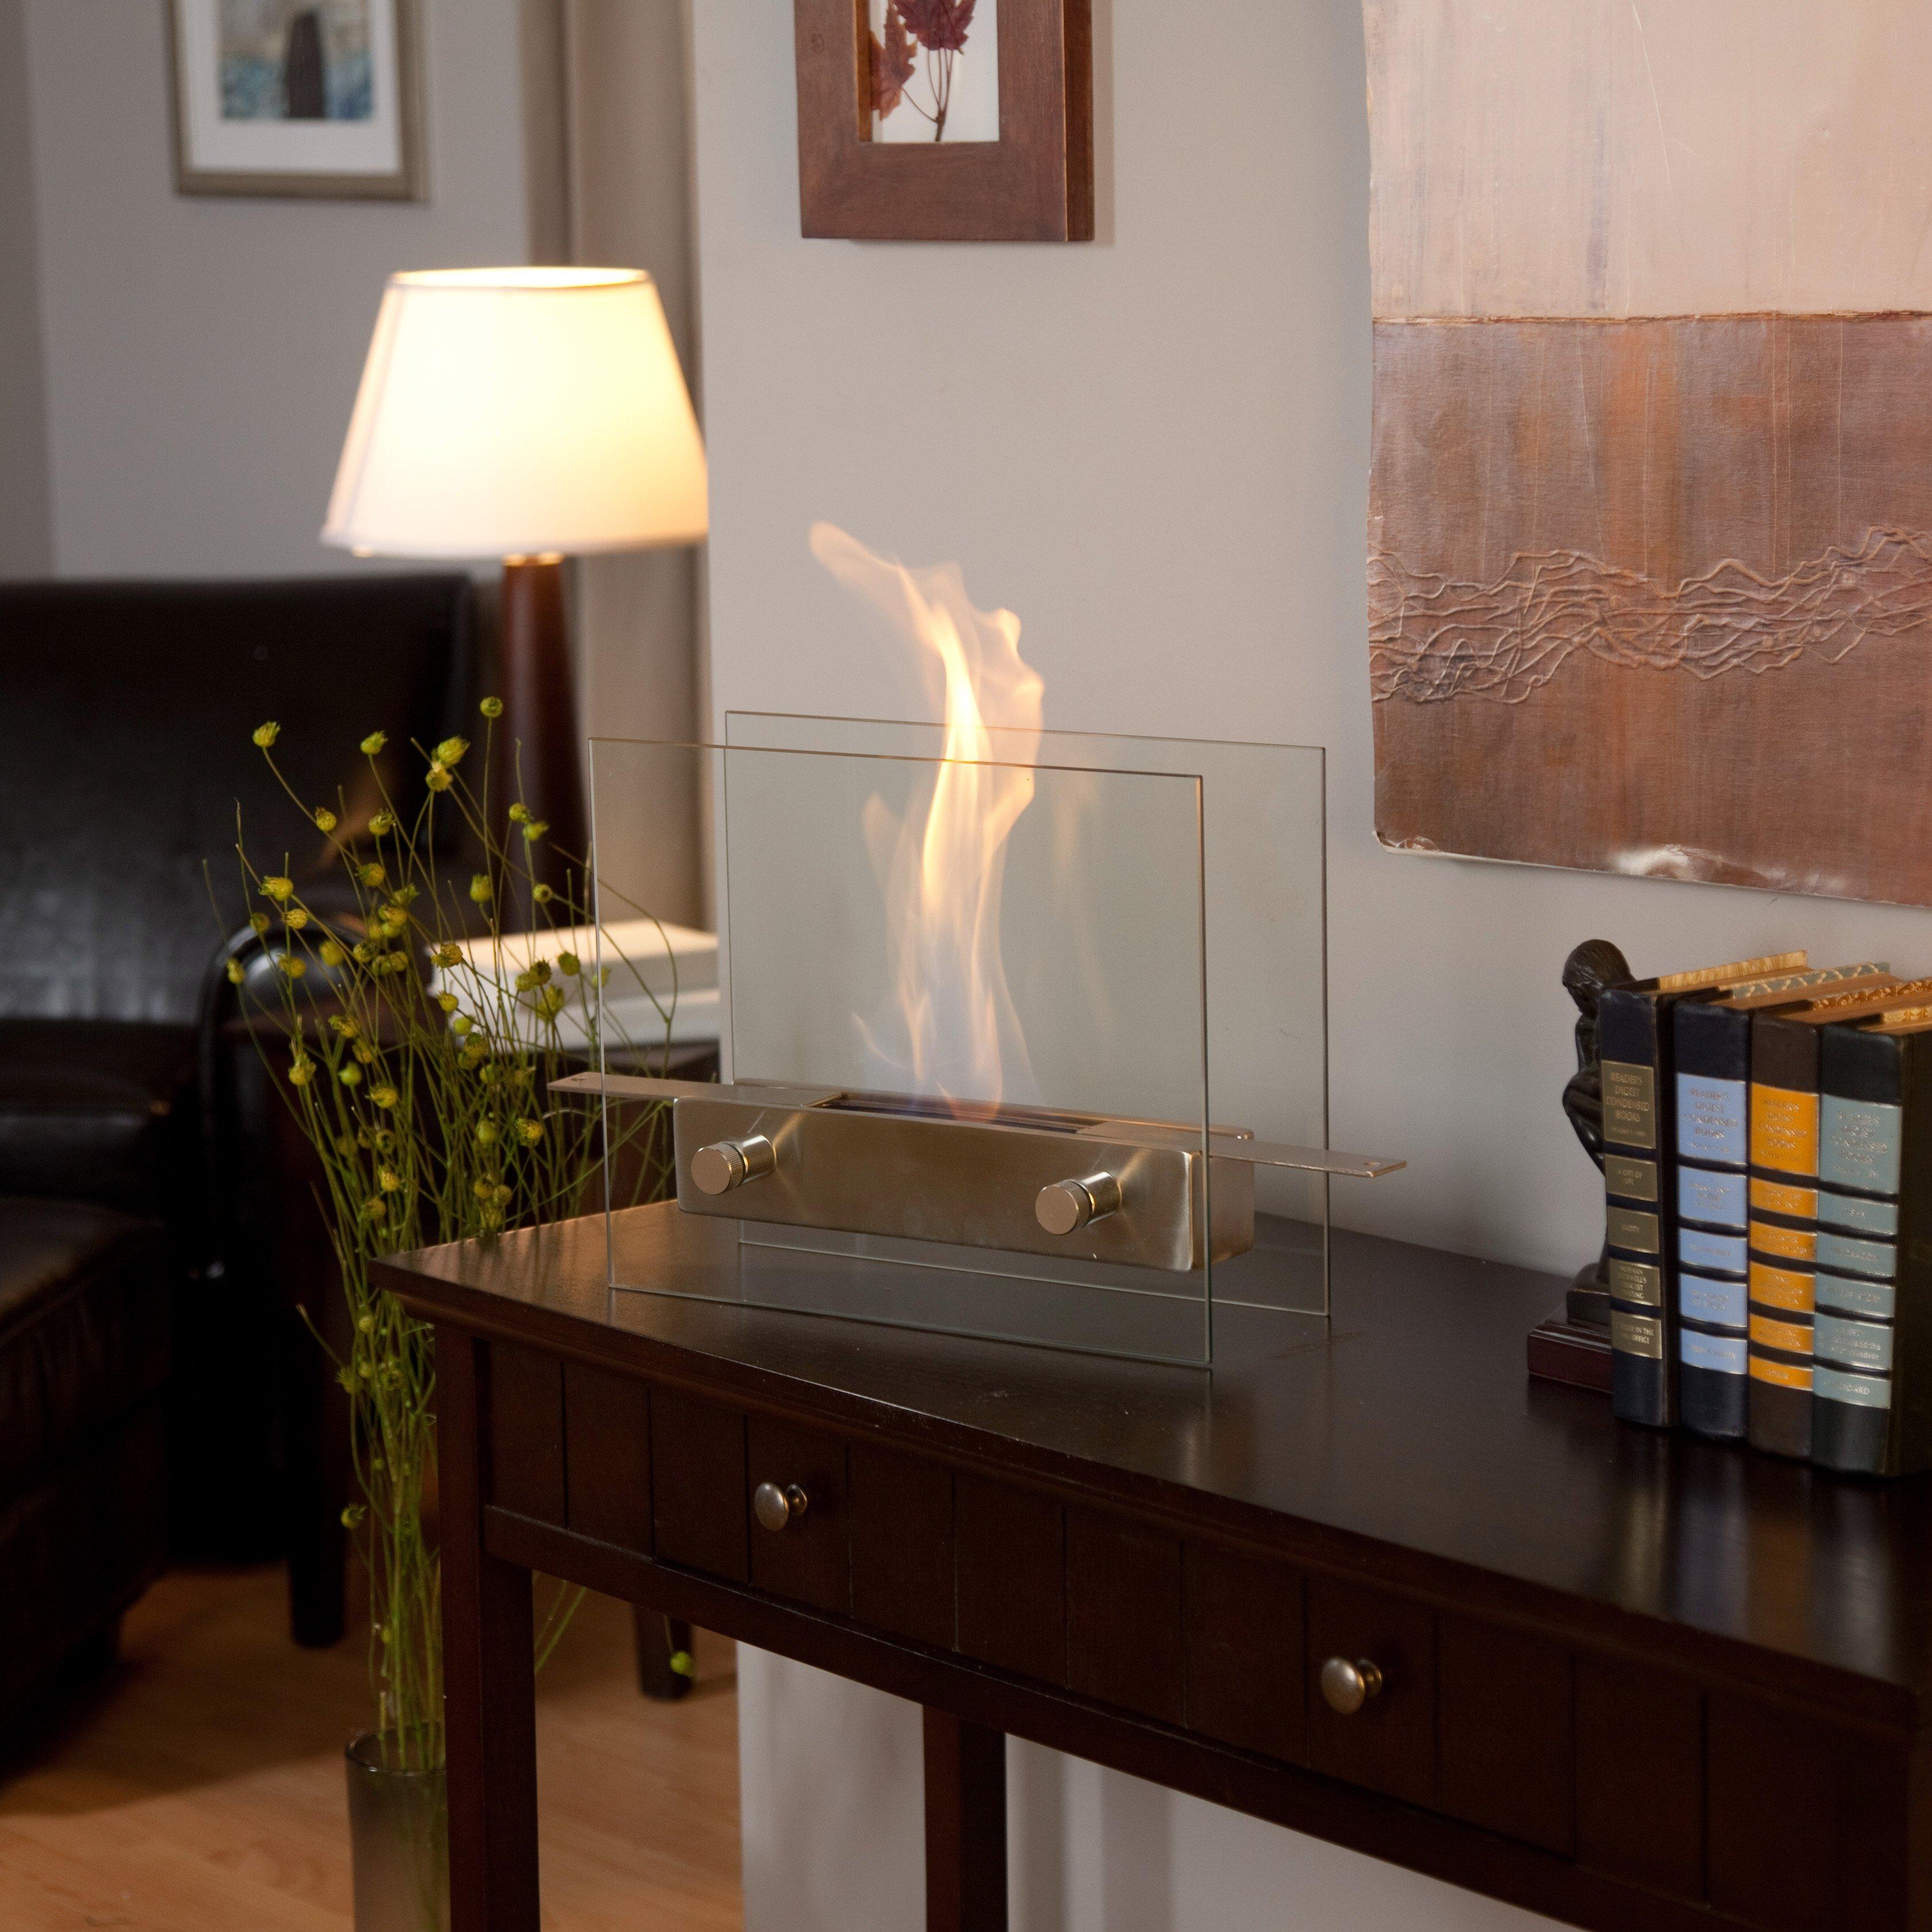 Anywhere Fireplace Metropolitan Indoor / Outdoor Fireplace